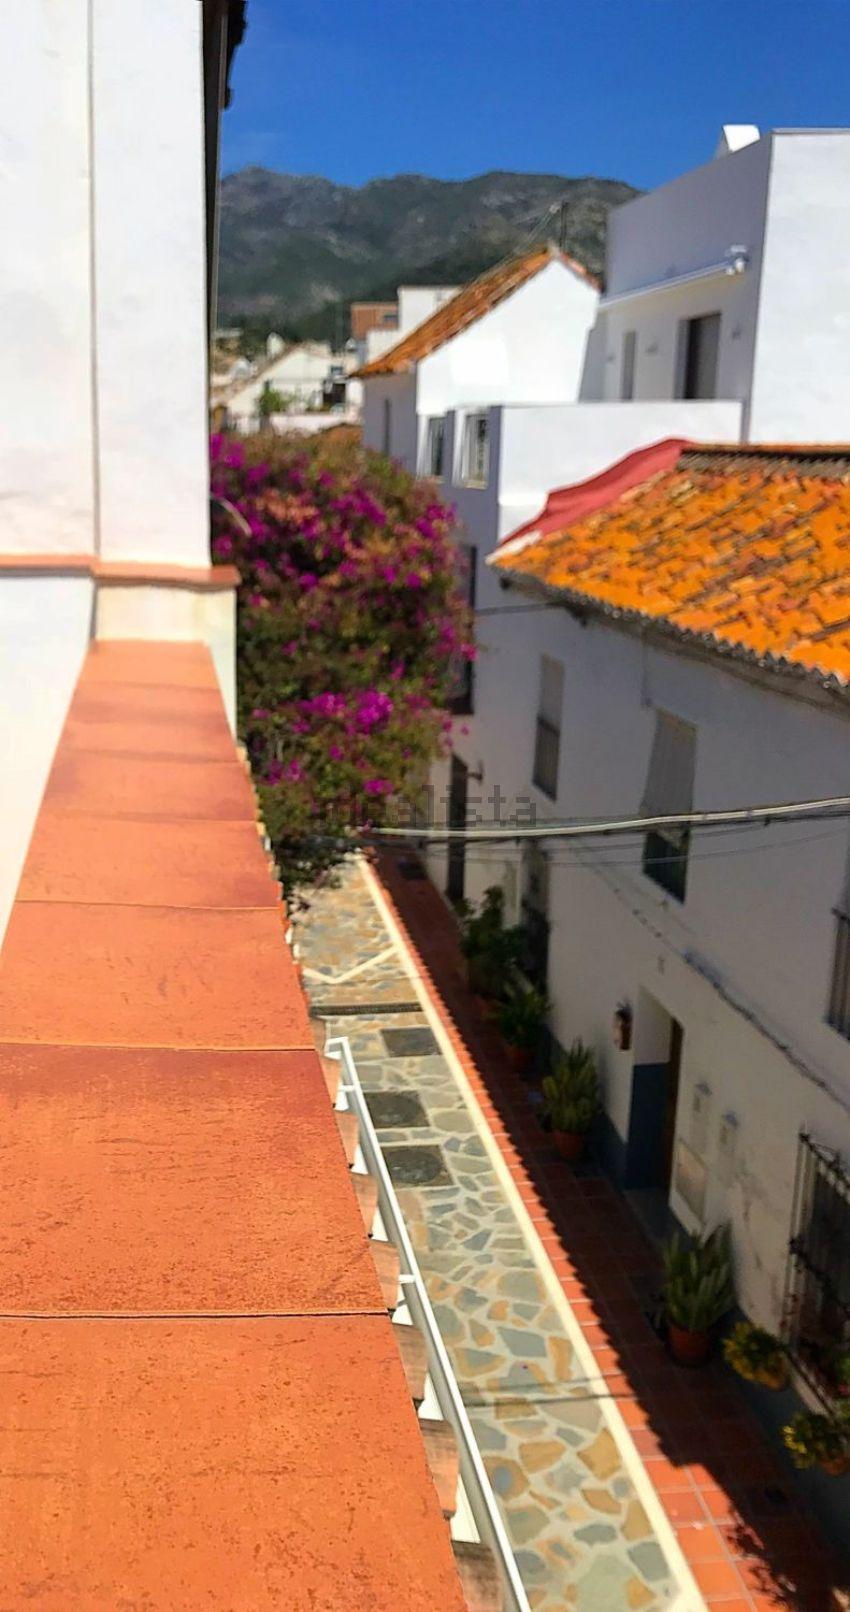 Chalet adosado en calle Lobatas, 11, Casco Antiguo, Marbella